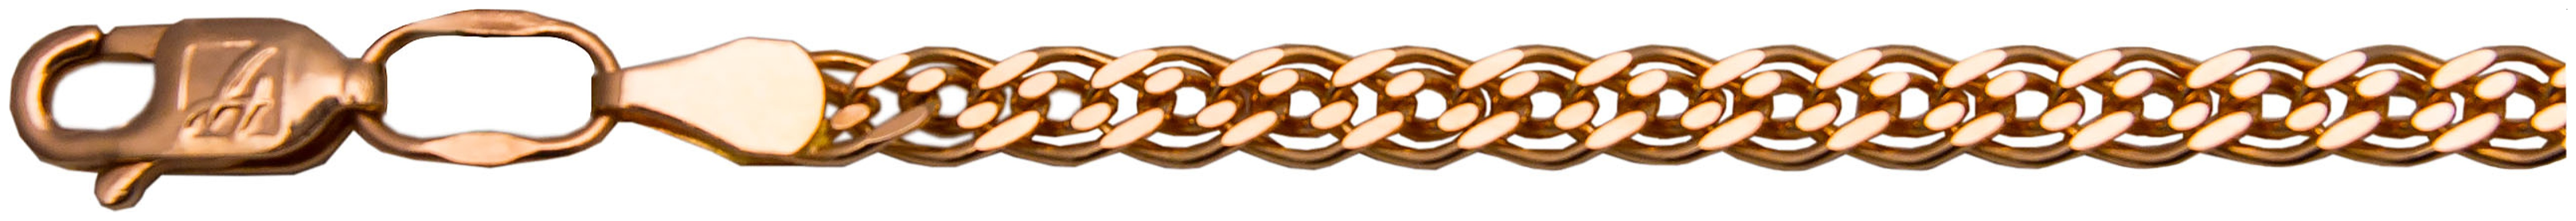 картинка цепь из золота 585° ЦН255А2-А51